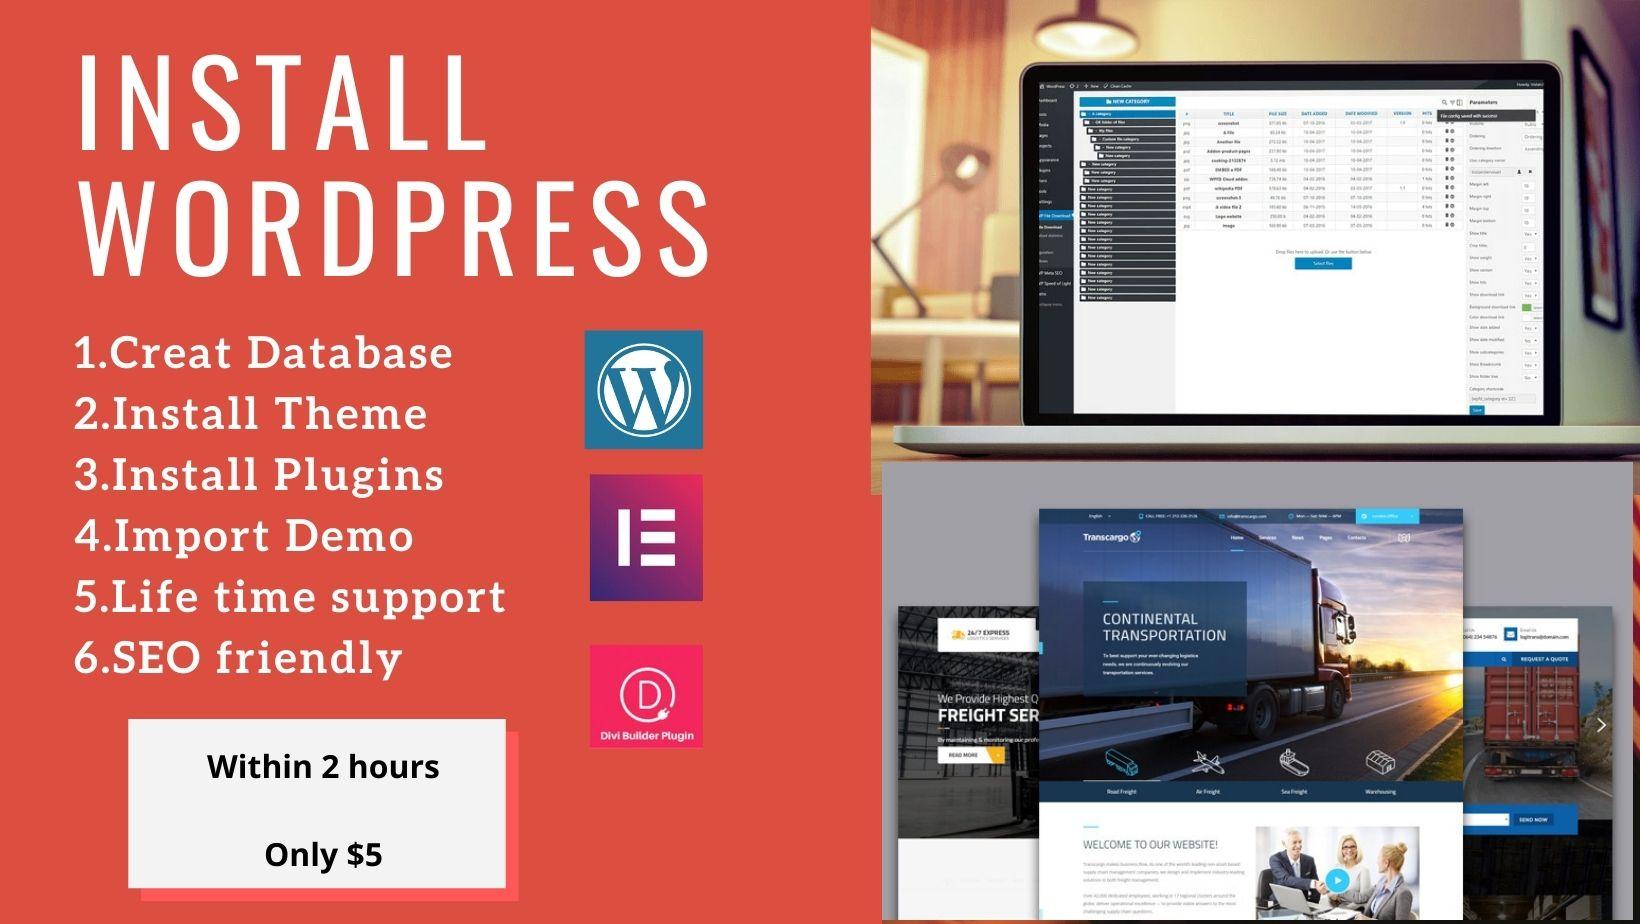 I will install wordpress, plugin, setup theme and creat database.